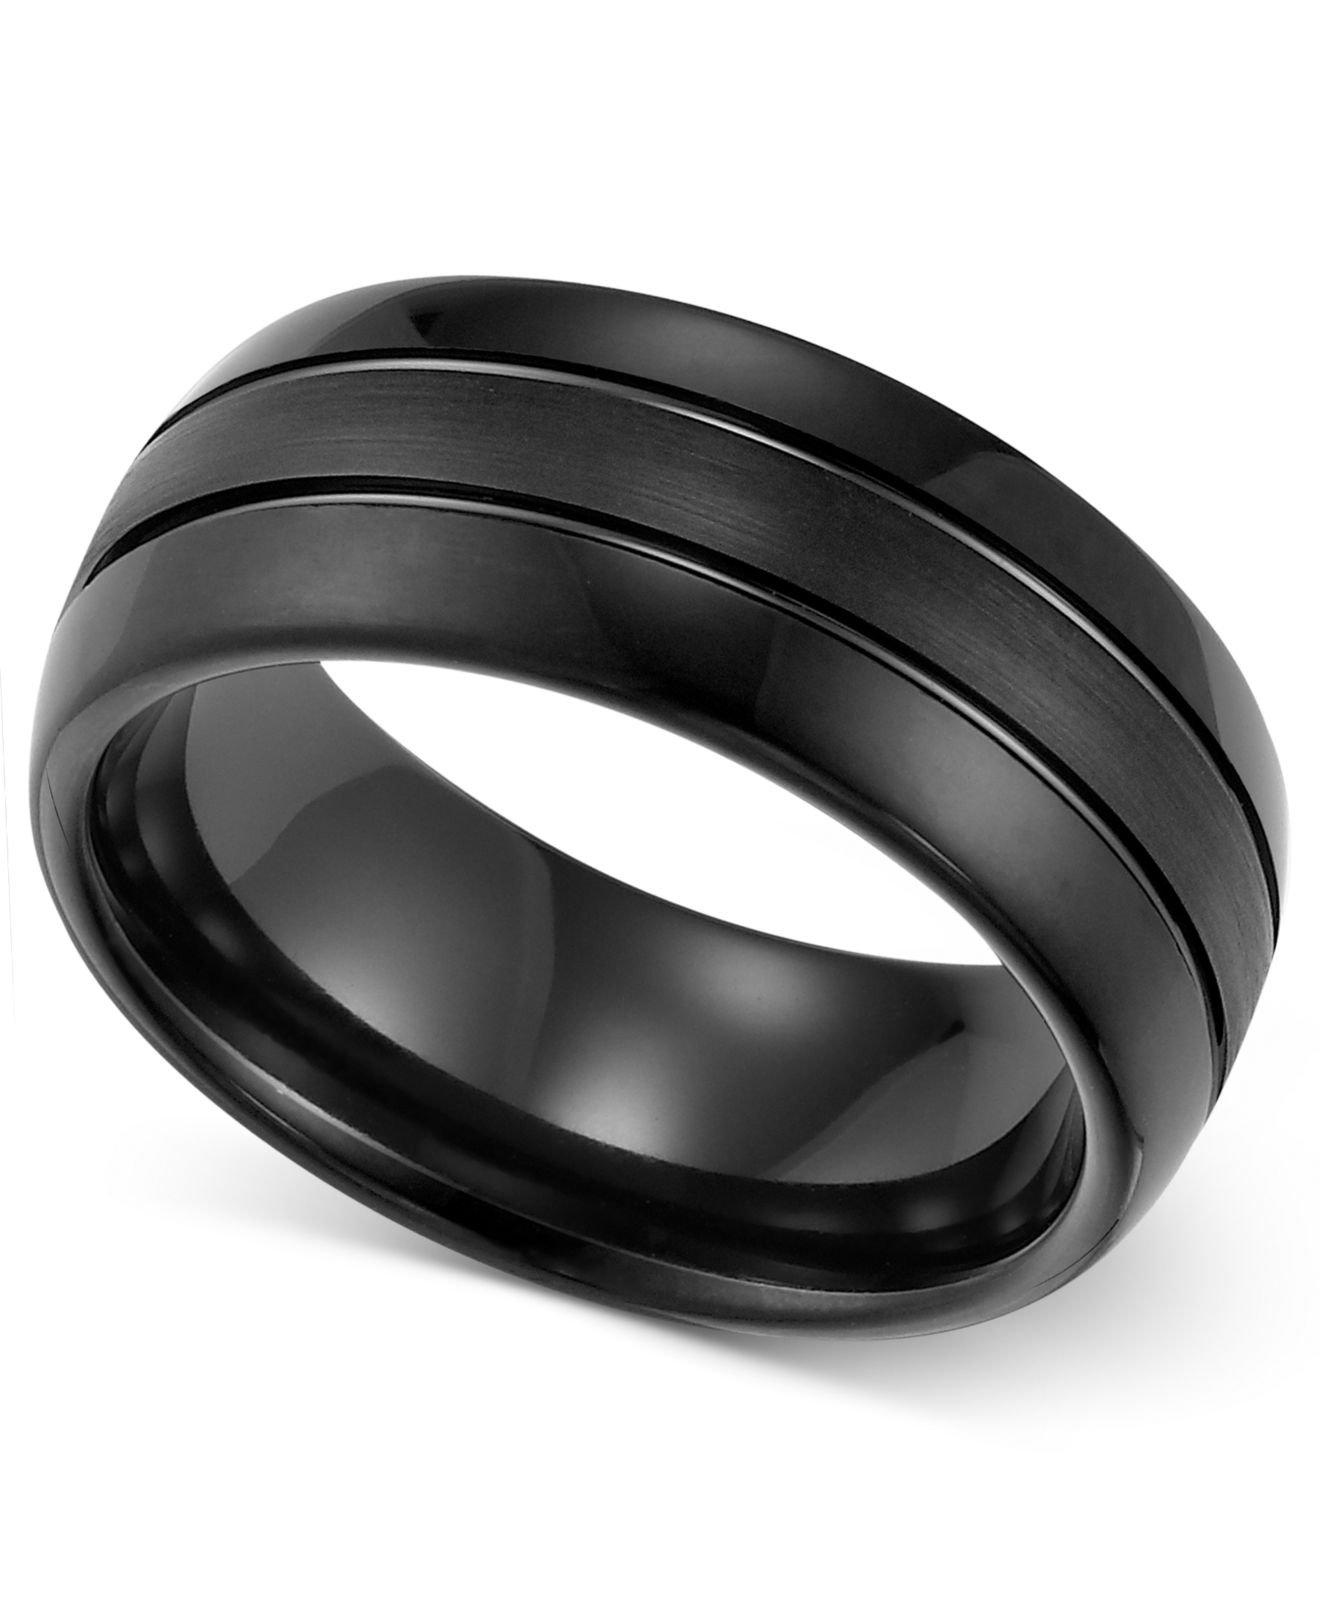 Triton Wedding Band Black Tungsten Carbide 8mm: Triton 8mm Black Tungsten 3-row Wedding Band In Black For